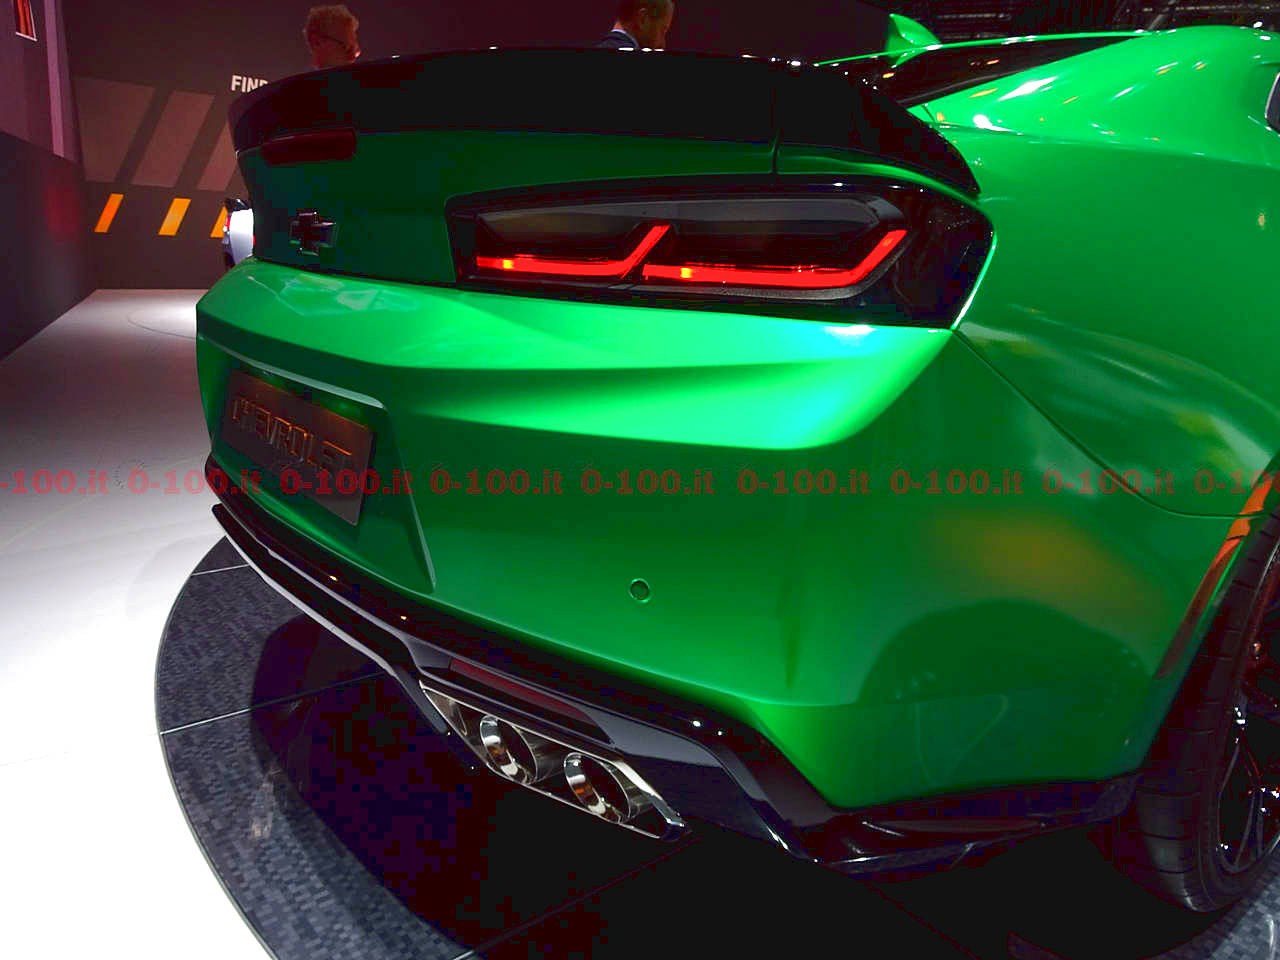 Ginevra-geneva-geneve-2017-Chevrolet-Camaro-Track-Concept-0-100_5